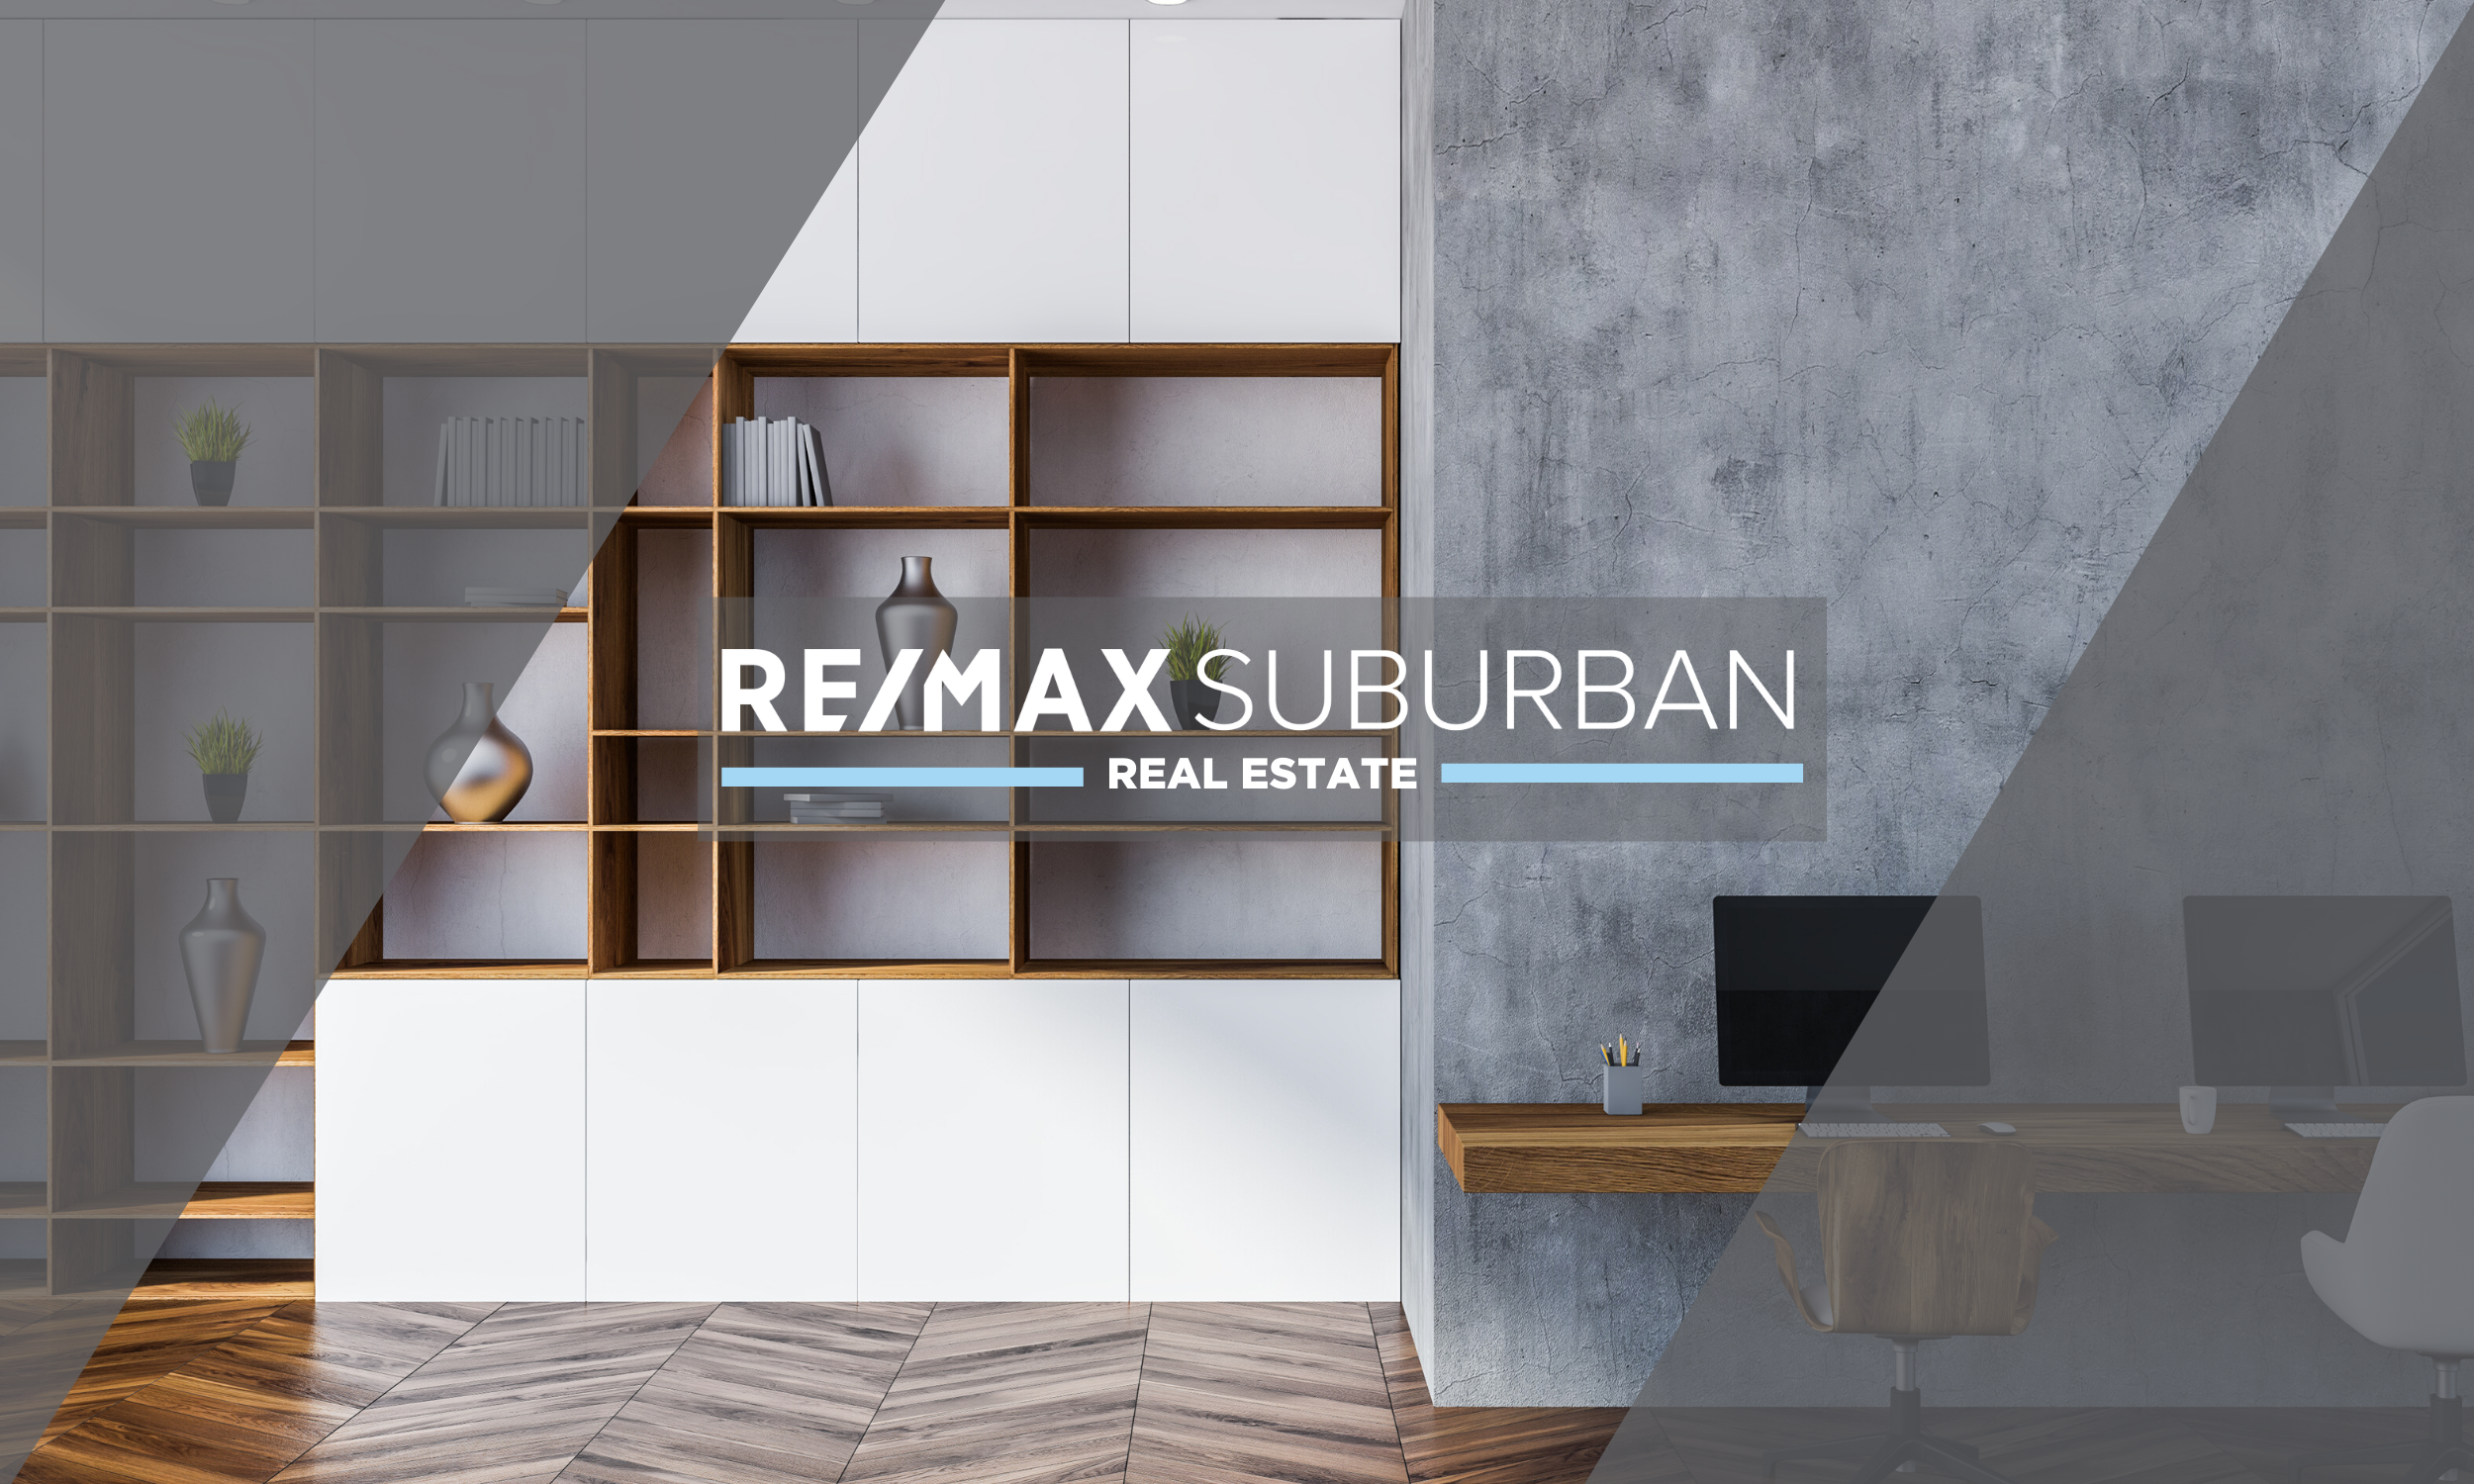 RE/MAX Suburban Real Estate